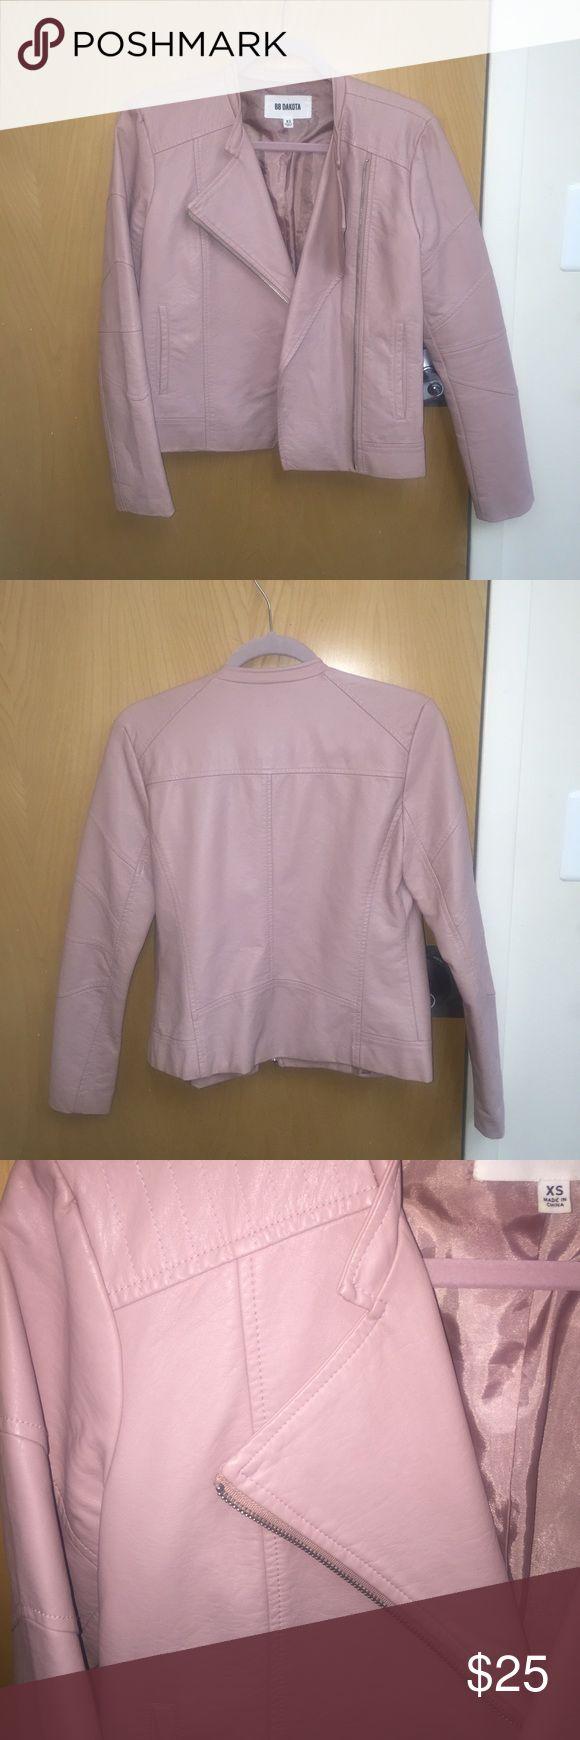 BB Dakota Jacket Worn once, wrinkled, shipped as is BB Dakota Jackets & Coats